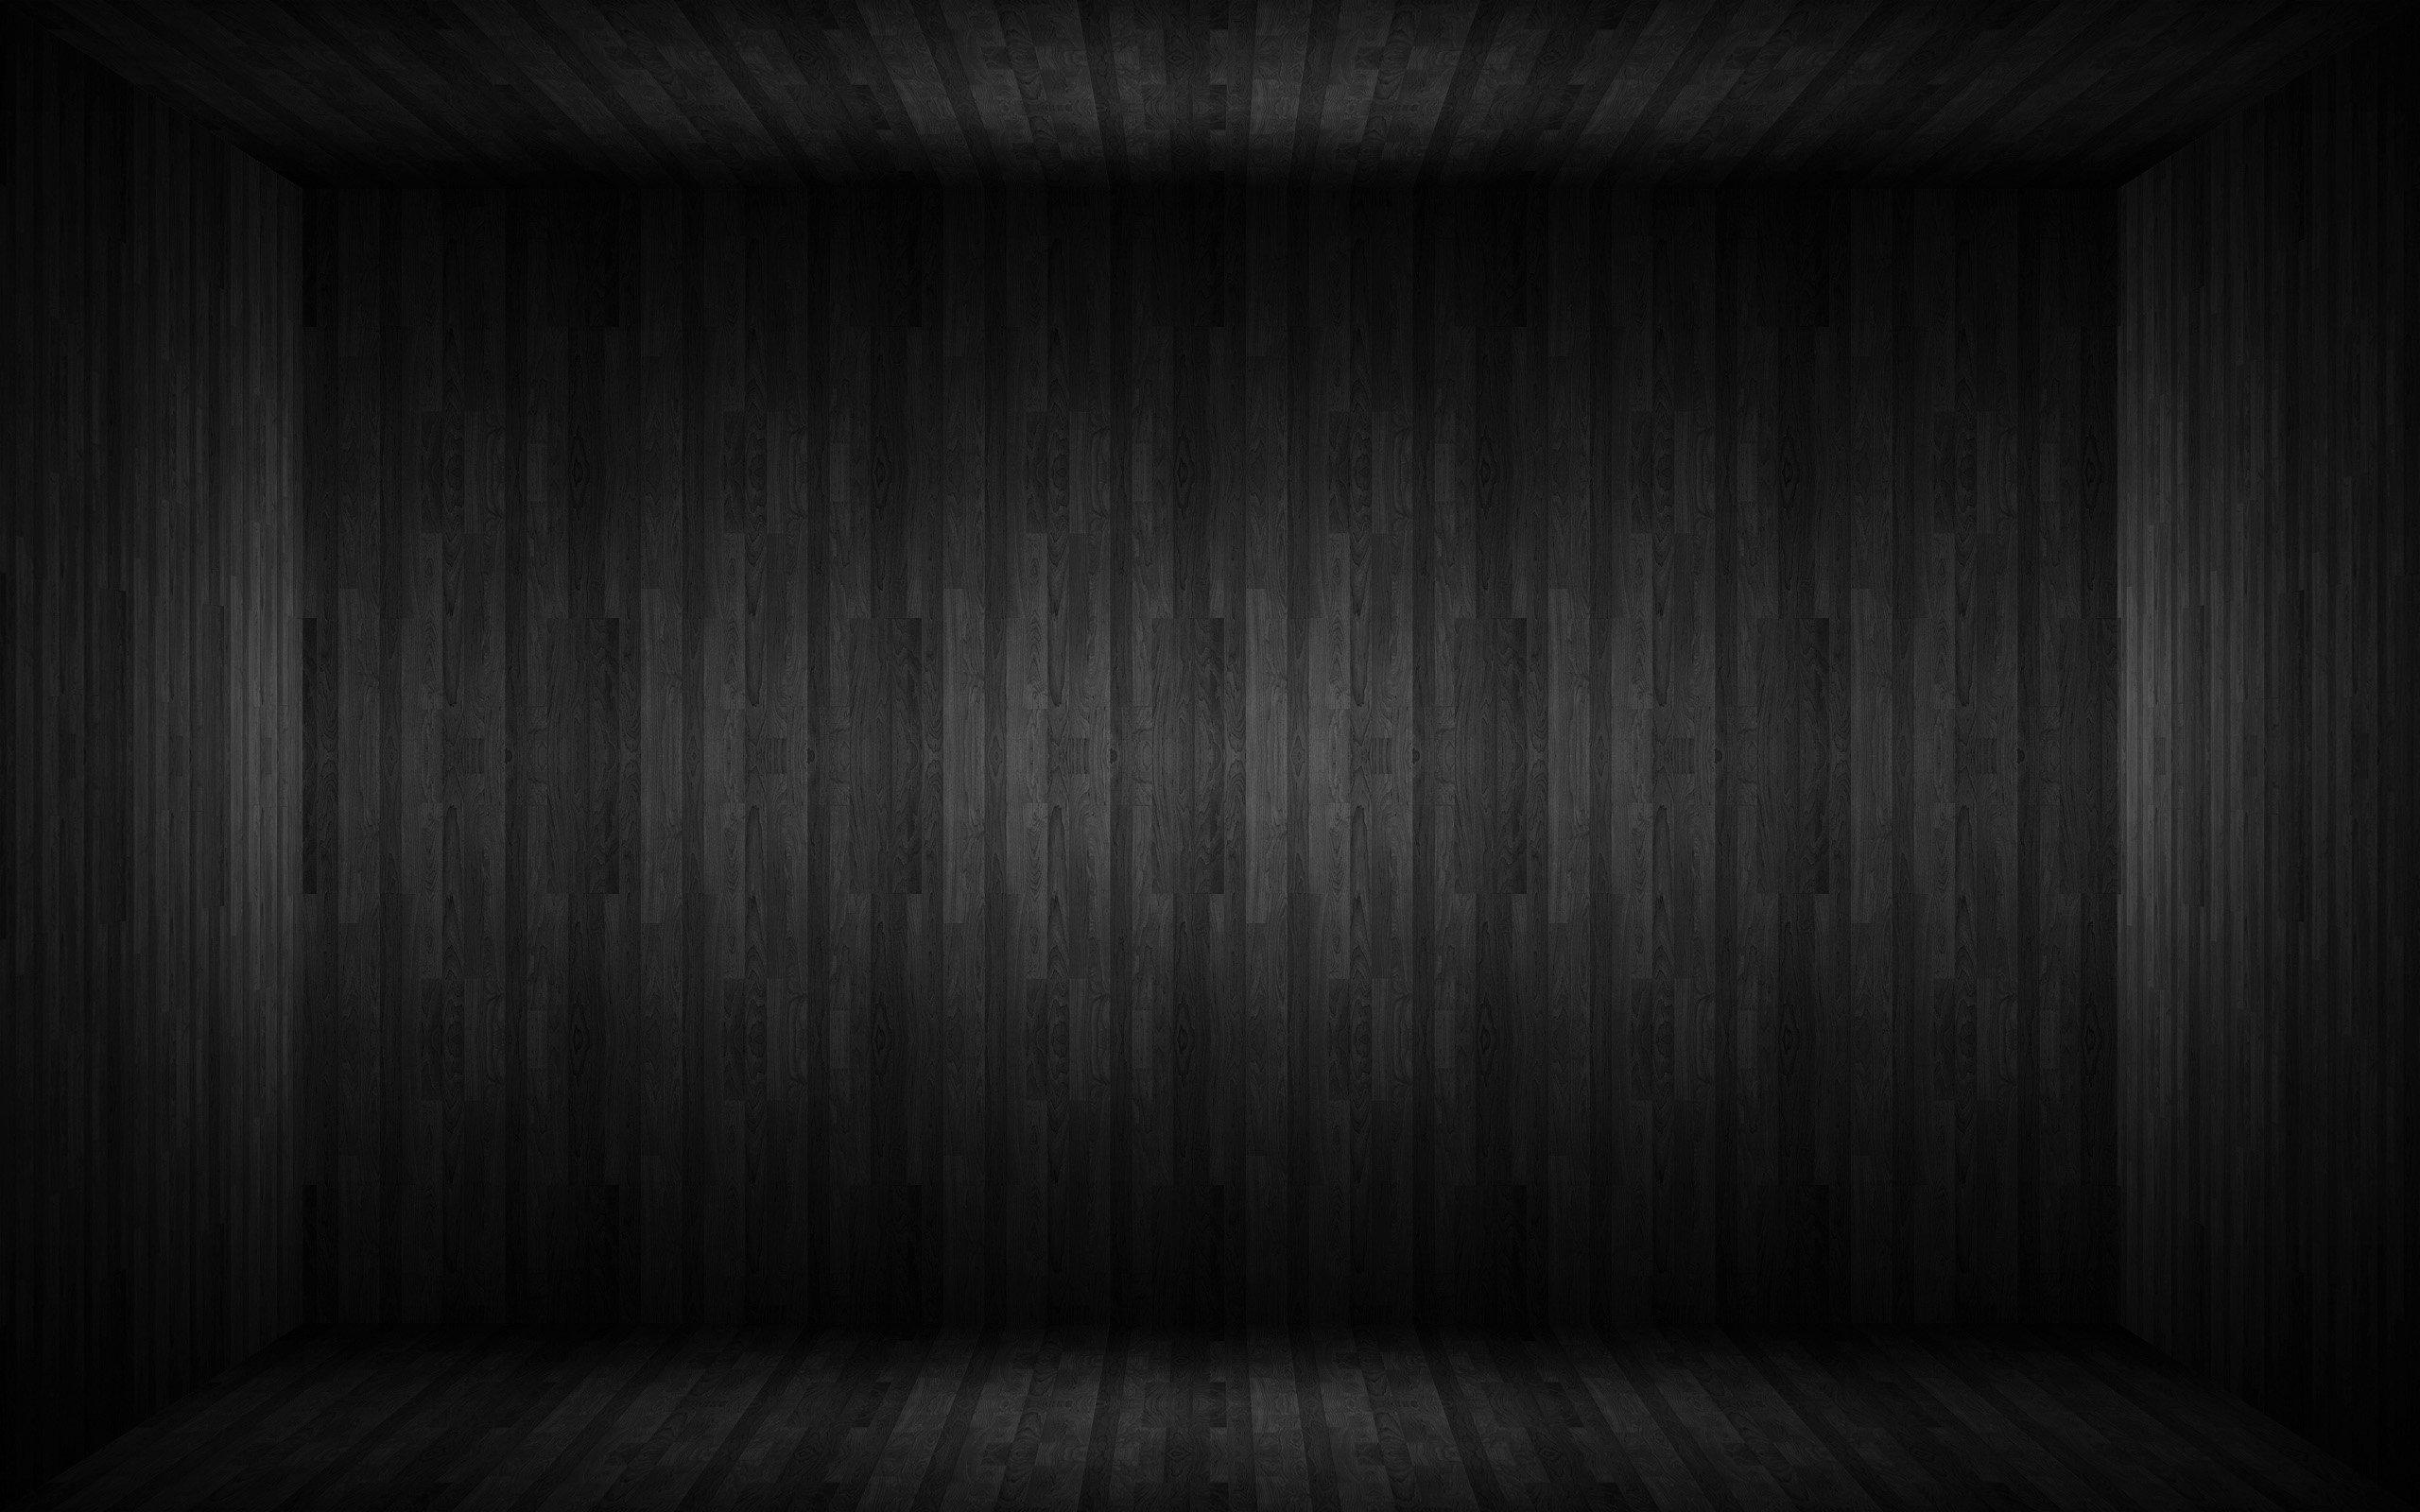 Black Wood Wallpaper 2560x1600 Black, Wood, 3d, This